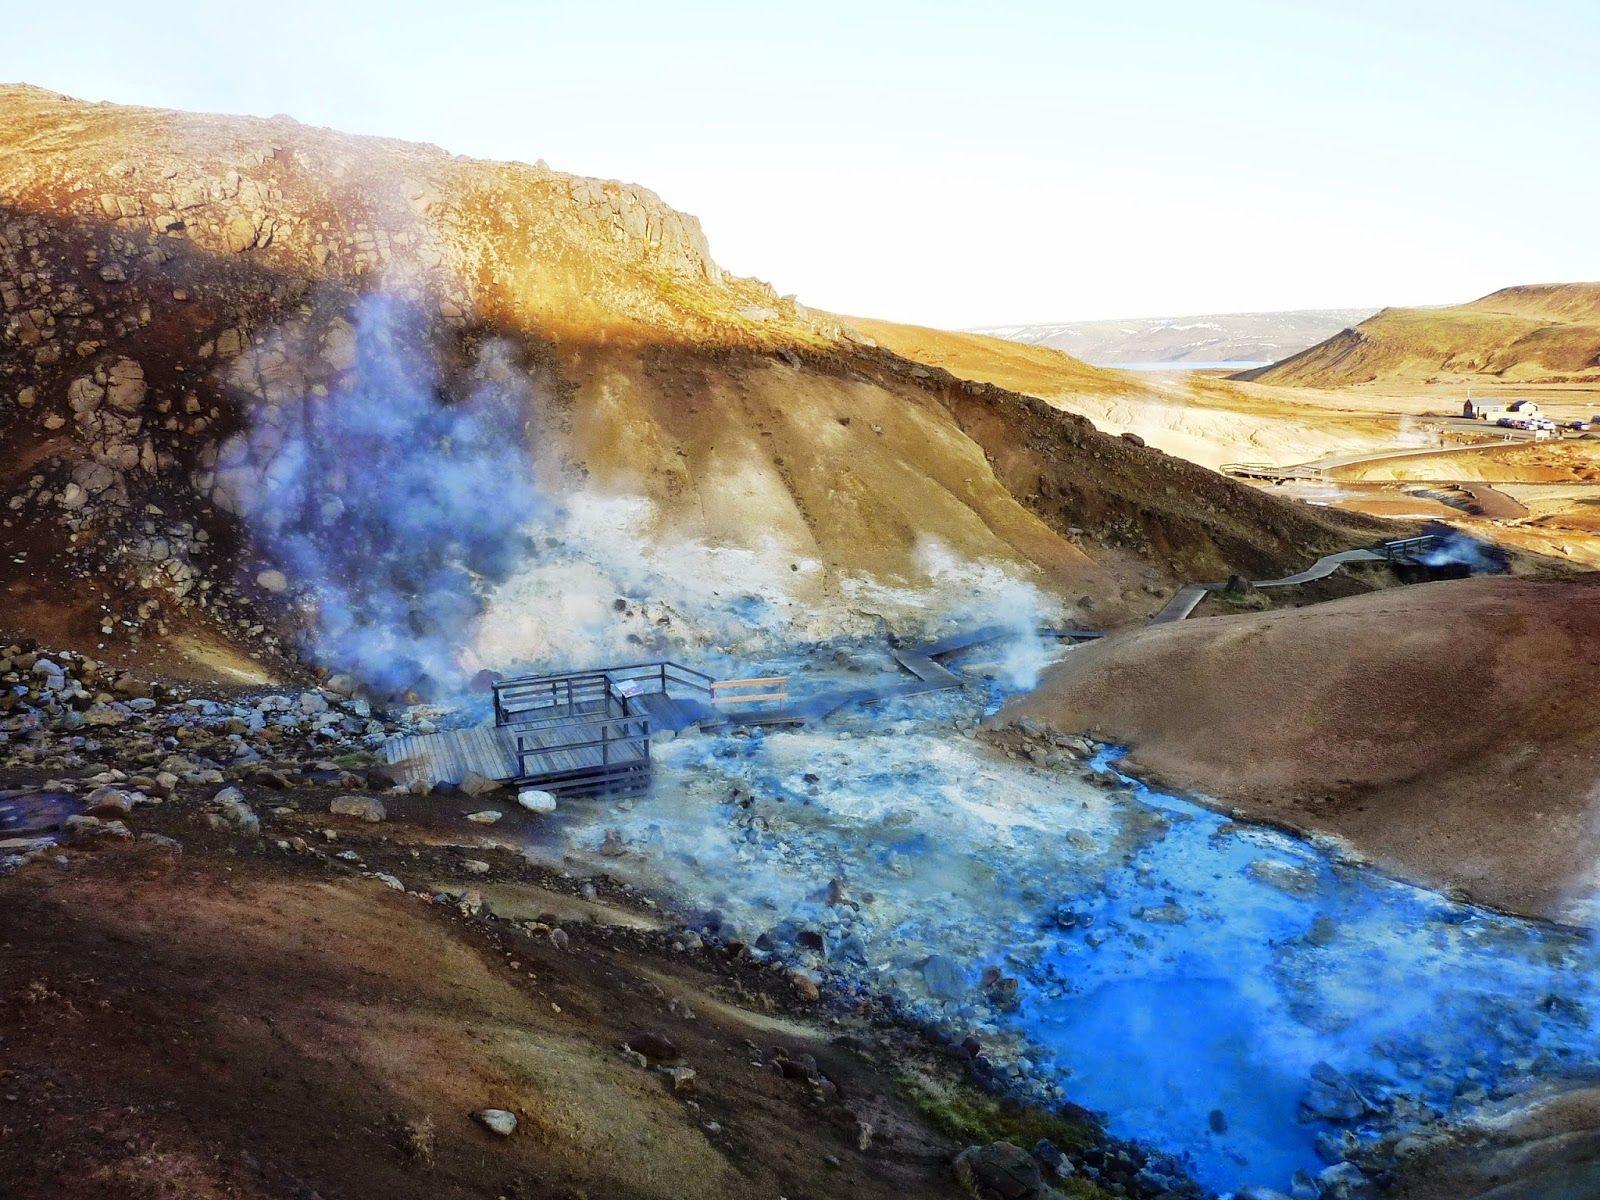 Nos carnets de route...: Islande #1 - 2014 - Jour 4 - Krýsuvík-Seltún